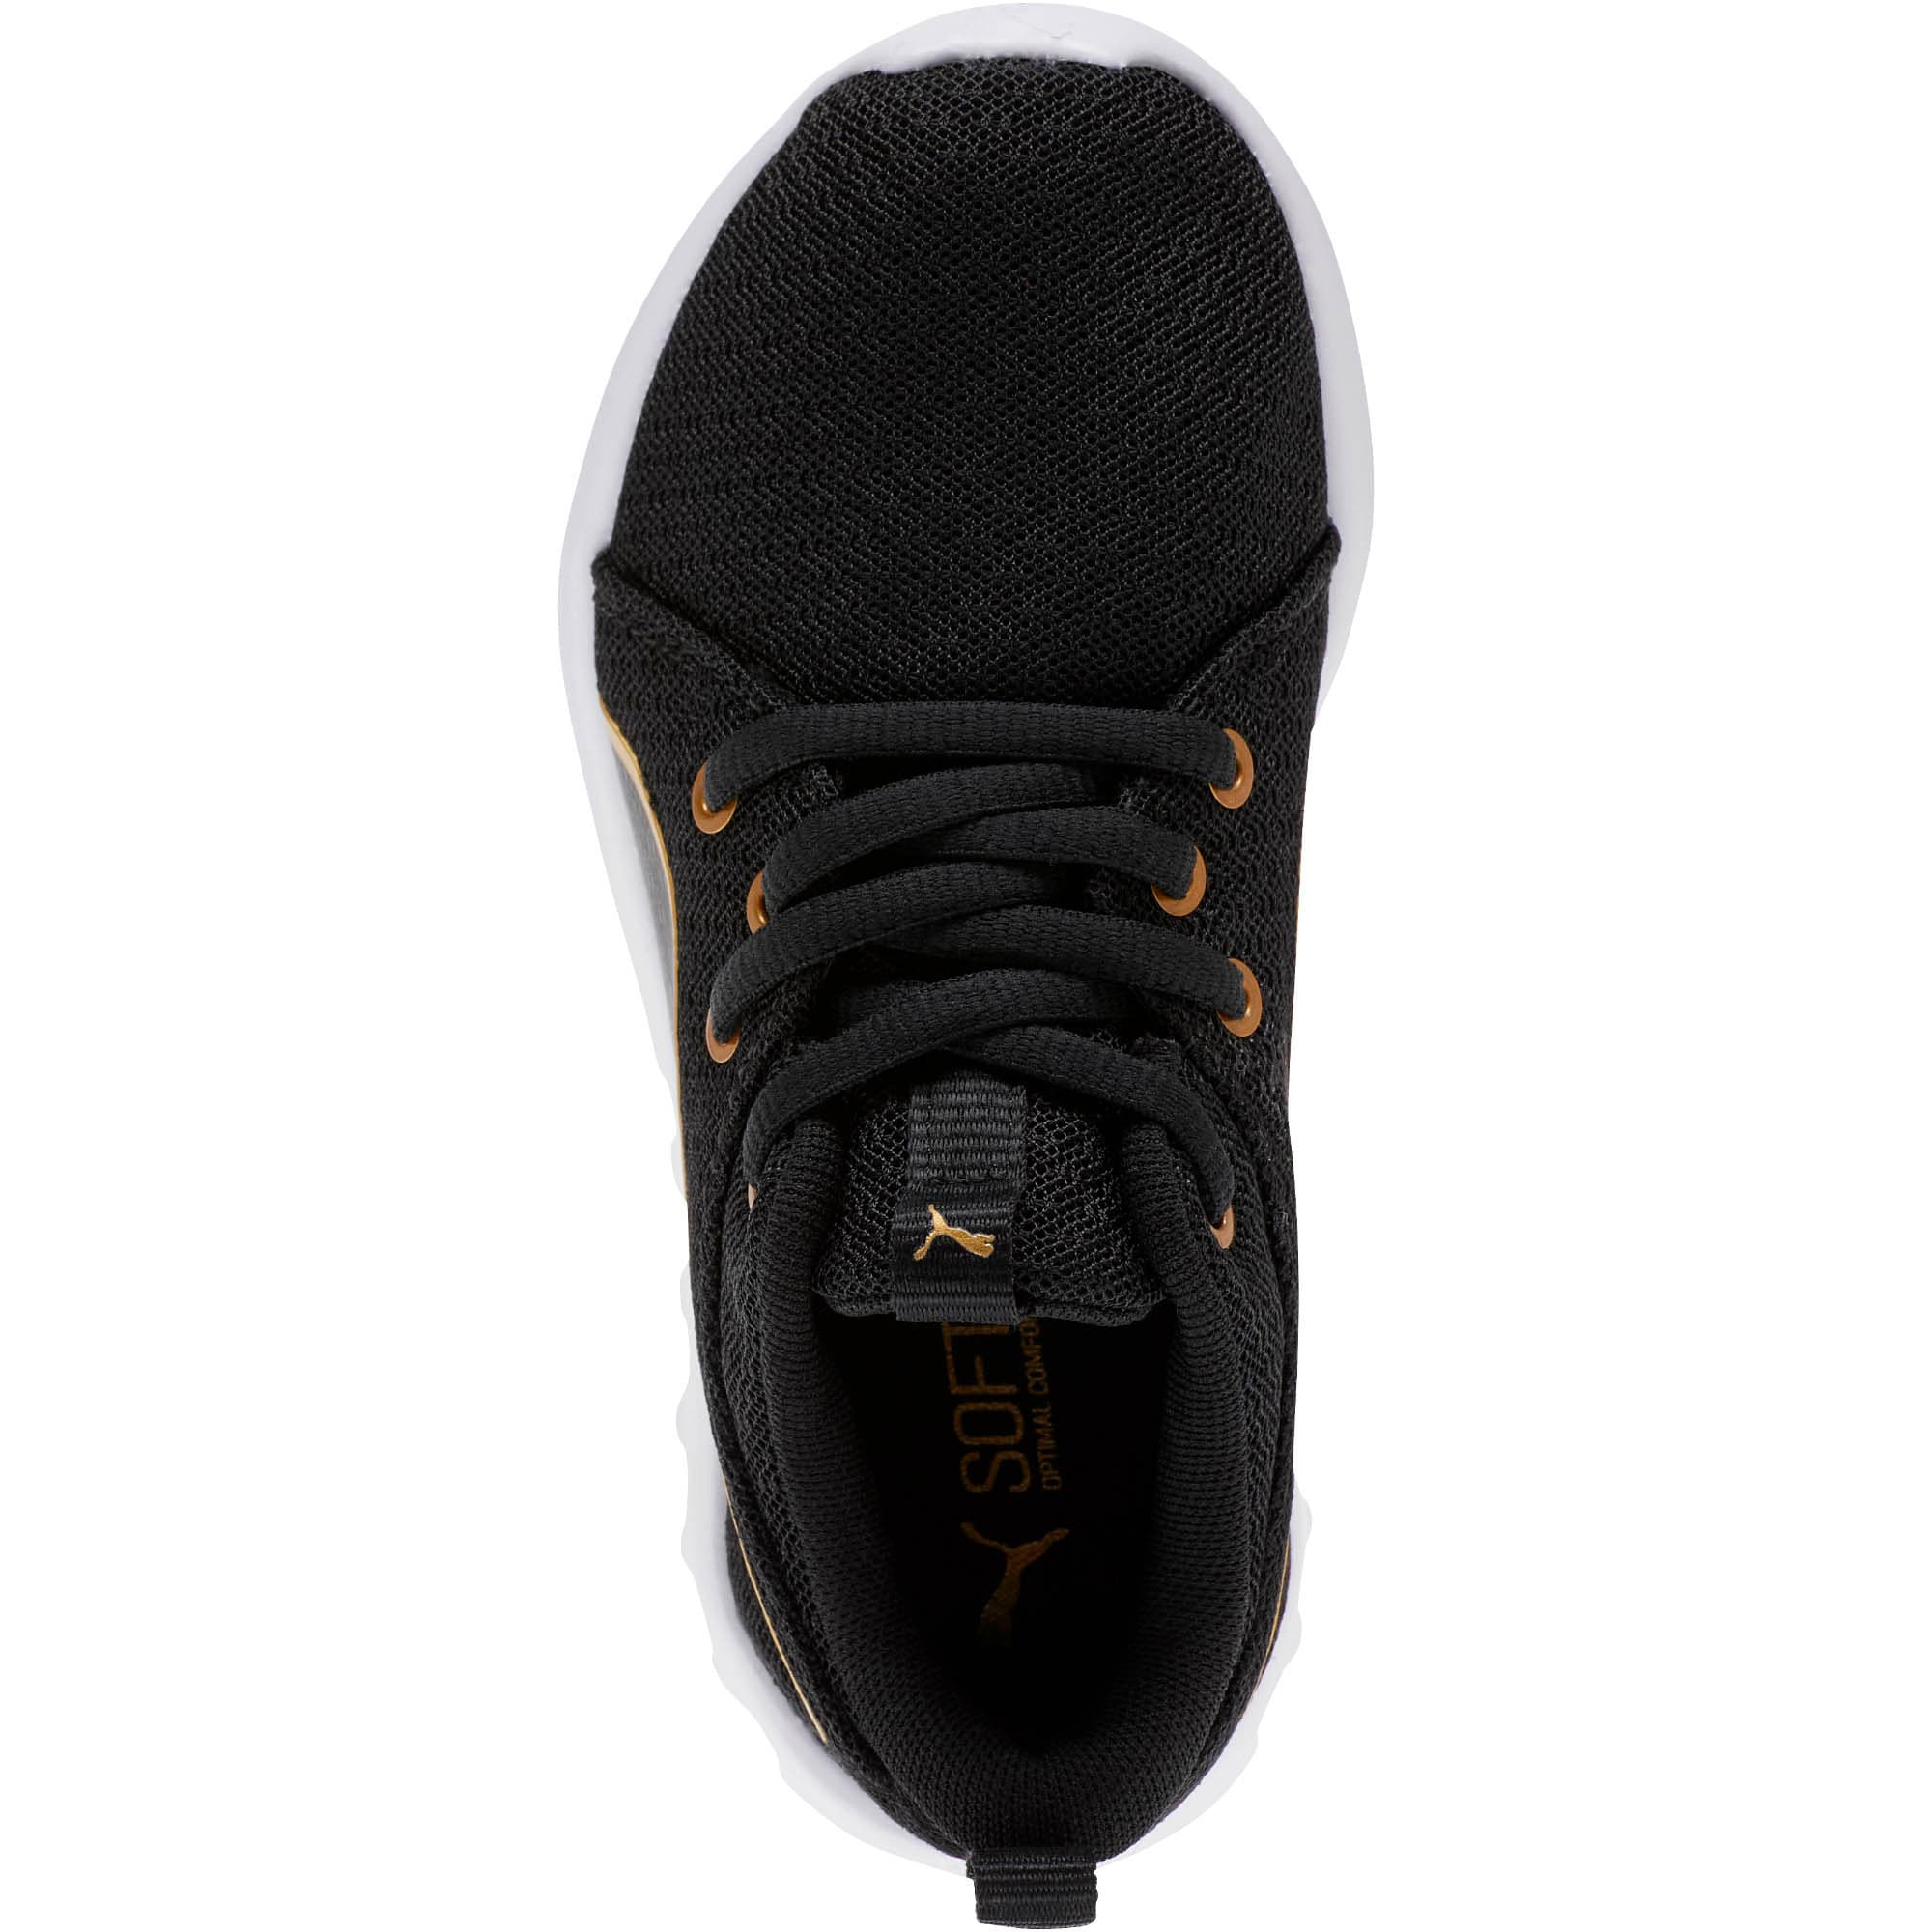 Thumbnail 5 of Carson 2 Metallic Mesh Little Kids' Shoes, Puma Black-Gold, medium